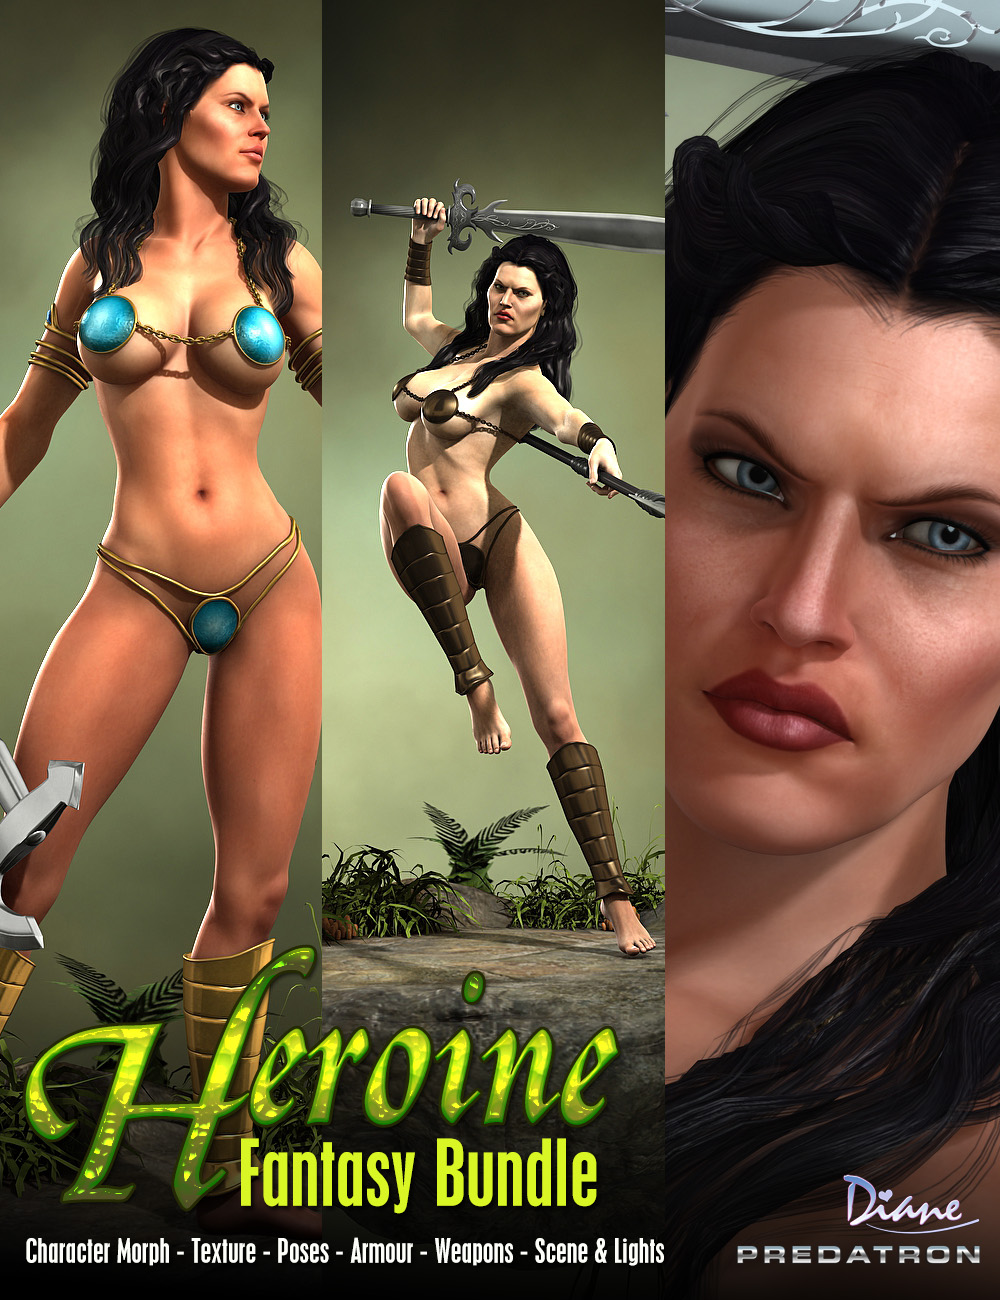 Heroine Fantasy Bundle by: DianePredatron, 3D Models by Daz 3D